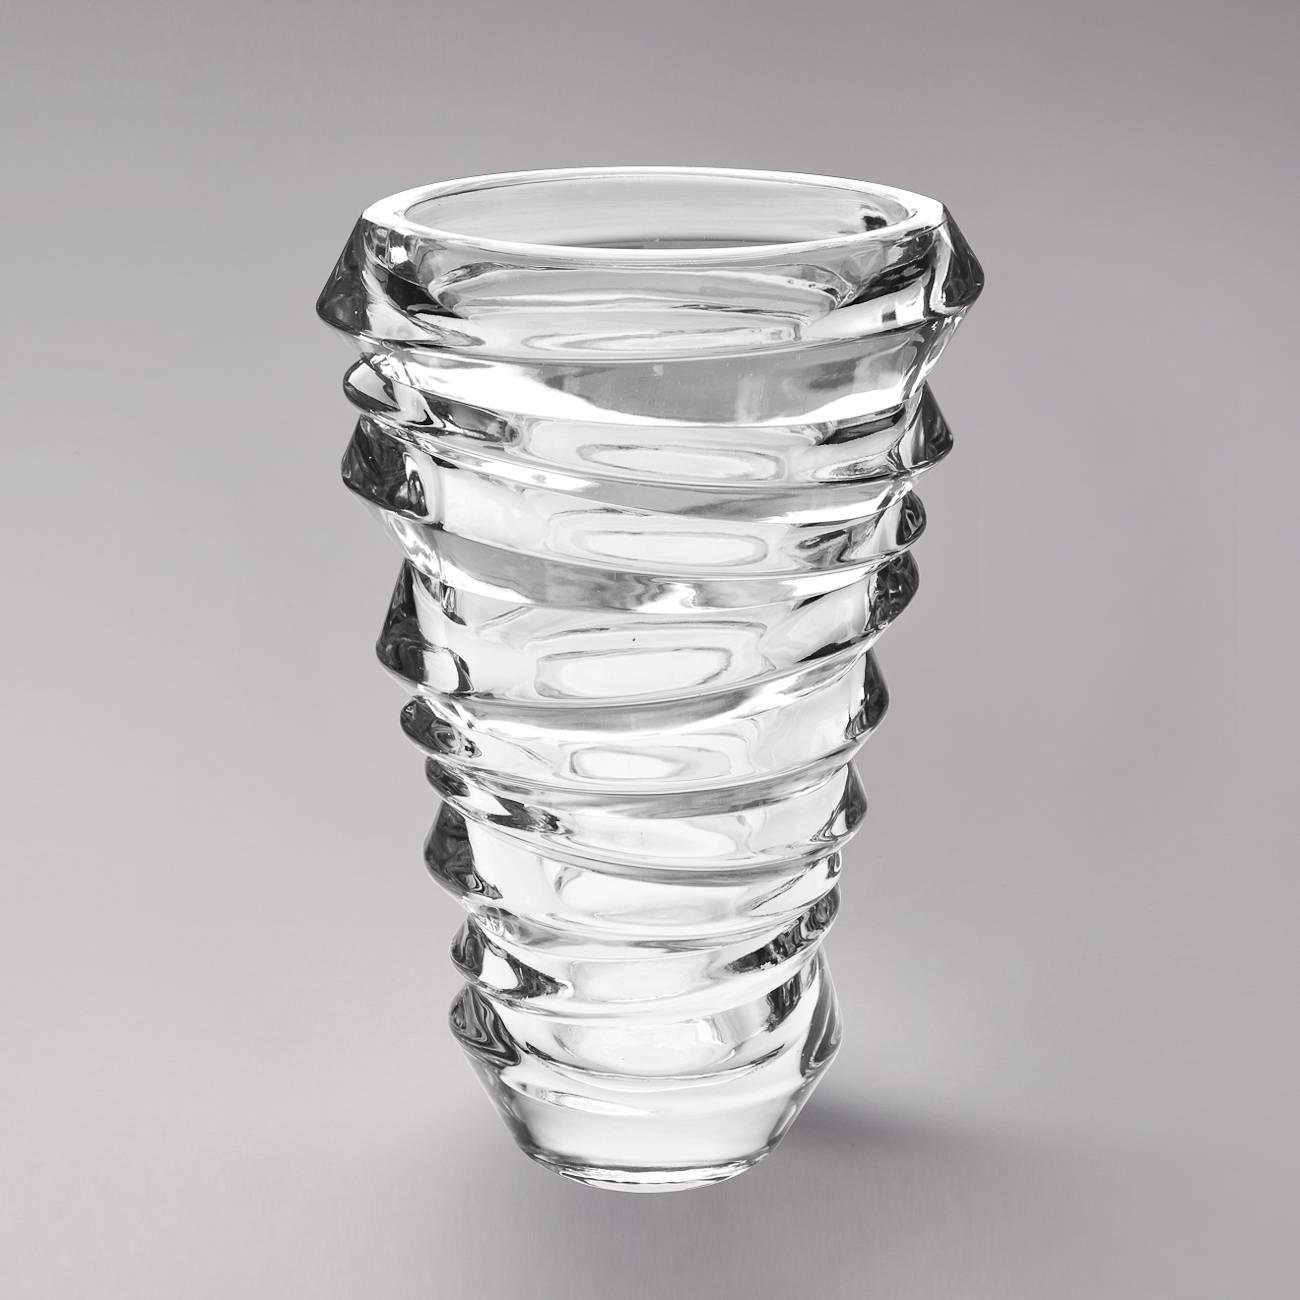 Vaso Reflections em Cristal - Wolff - 24 cm